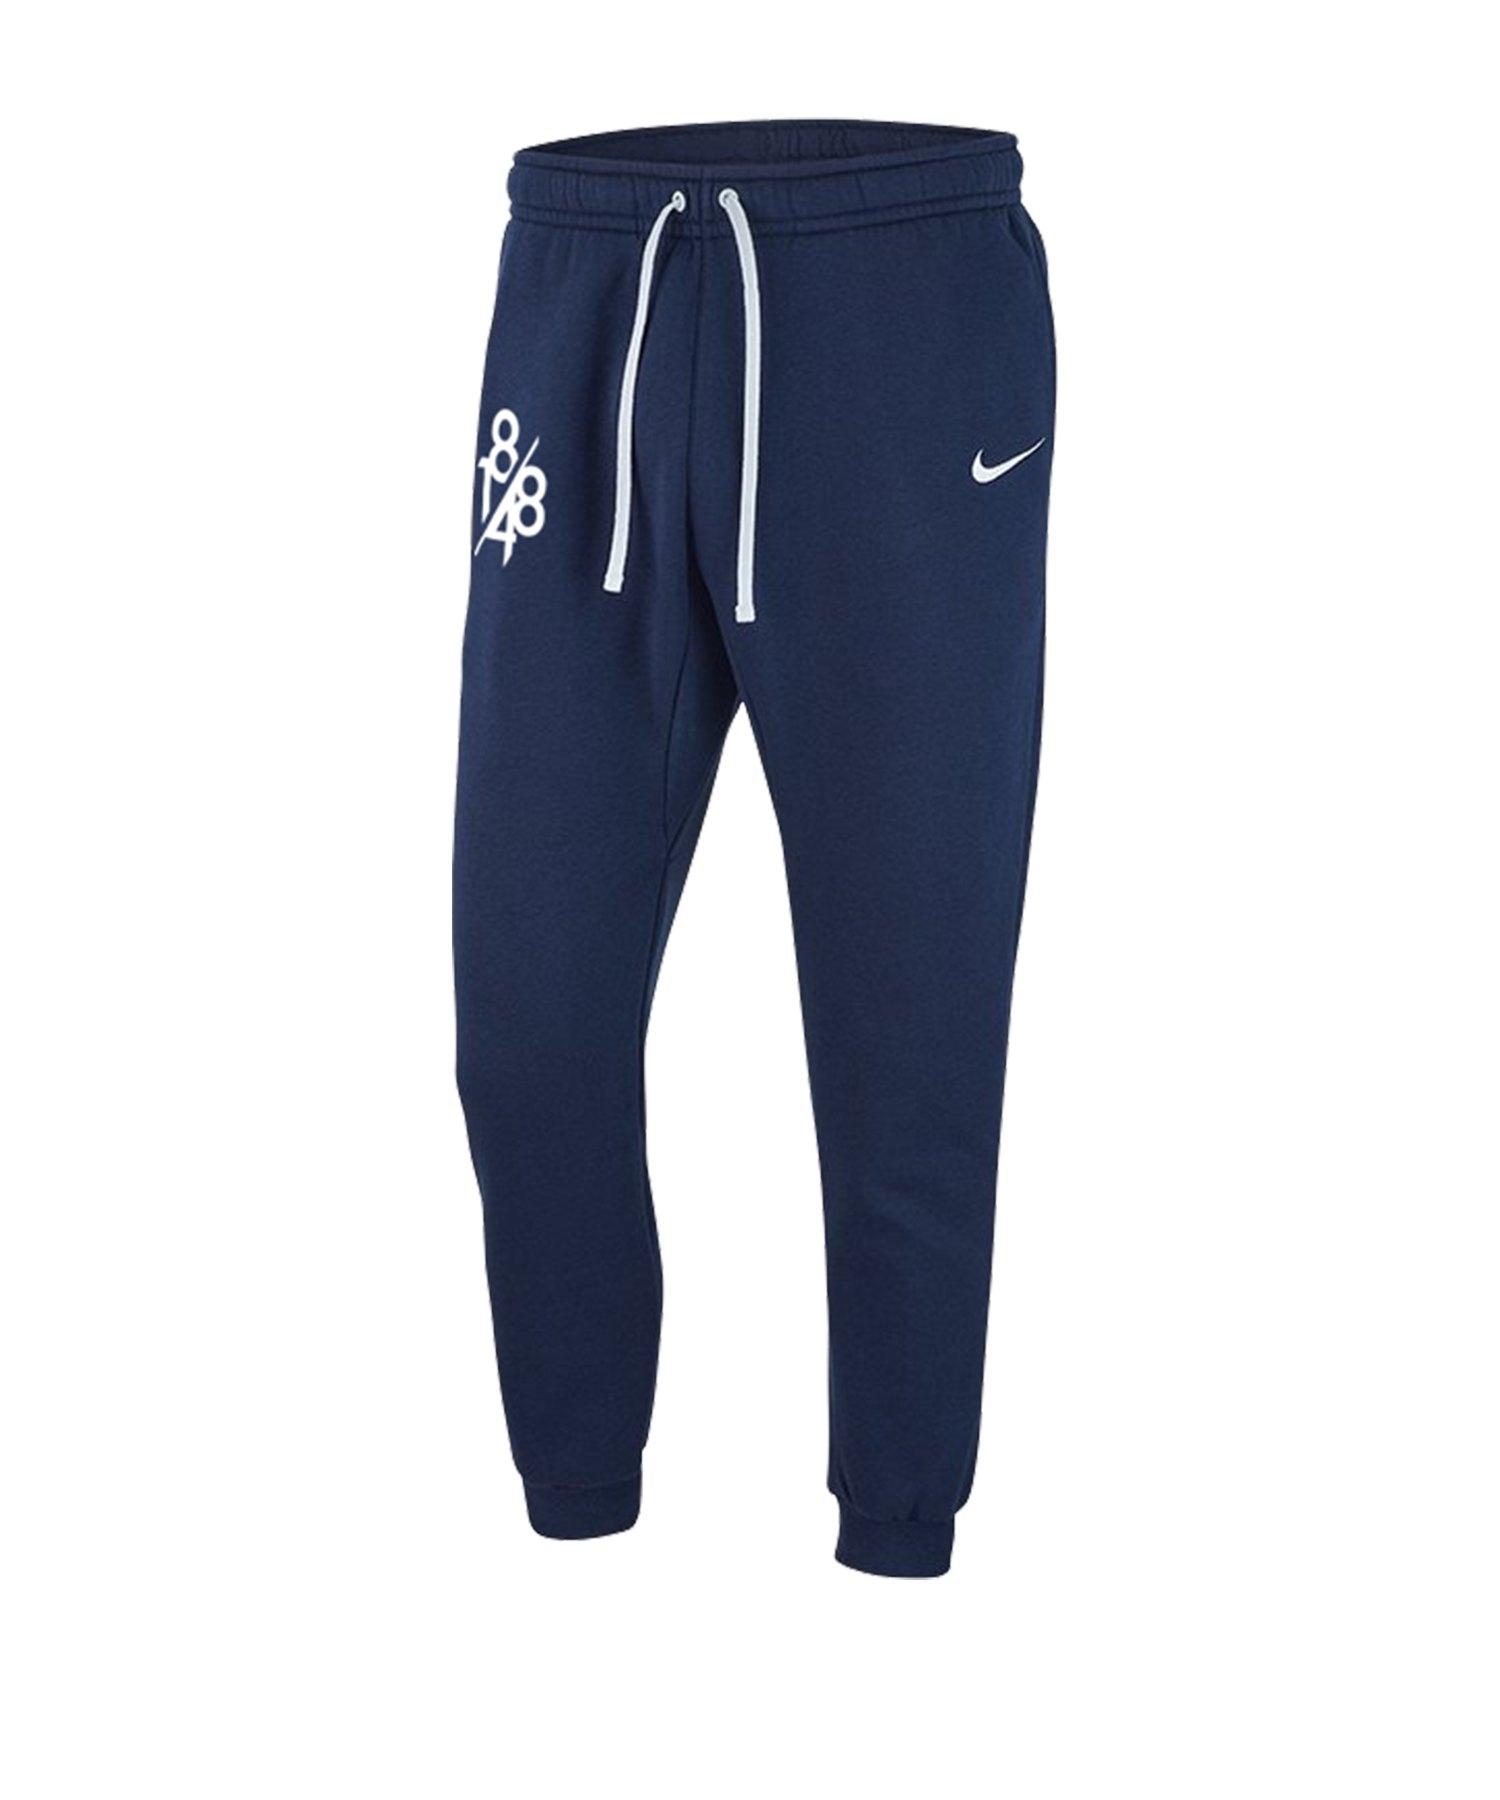 Nike VfL Bochum Jogginghose Kids Blau F451 - blau